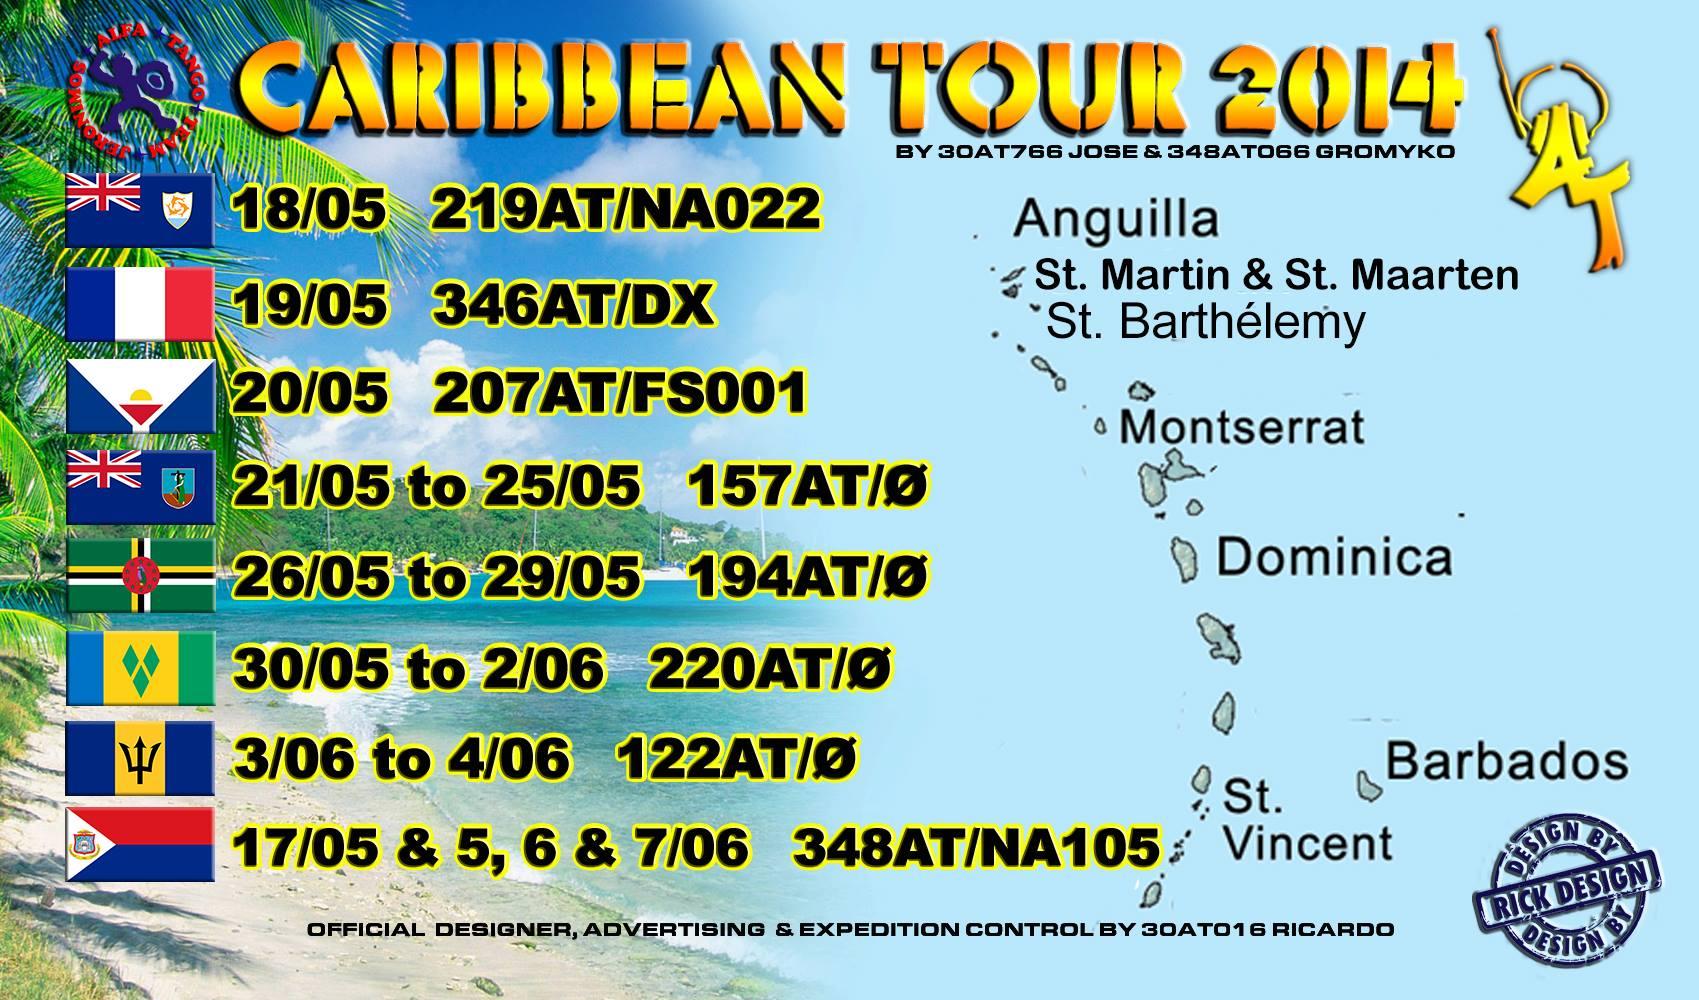 Caribbean IOTA Tour 2014